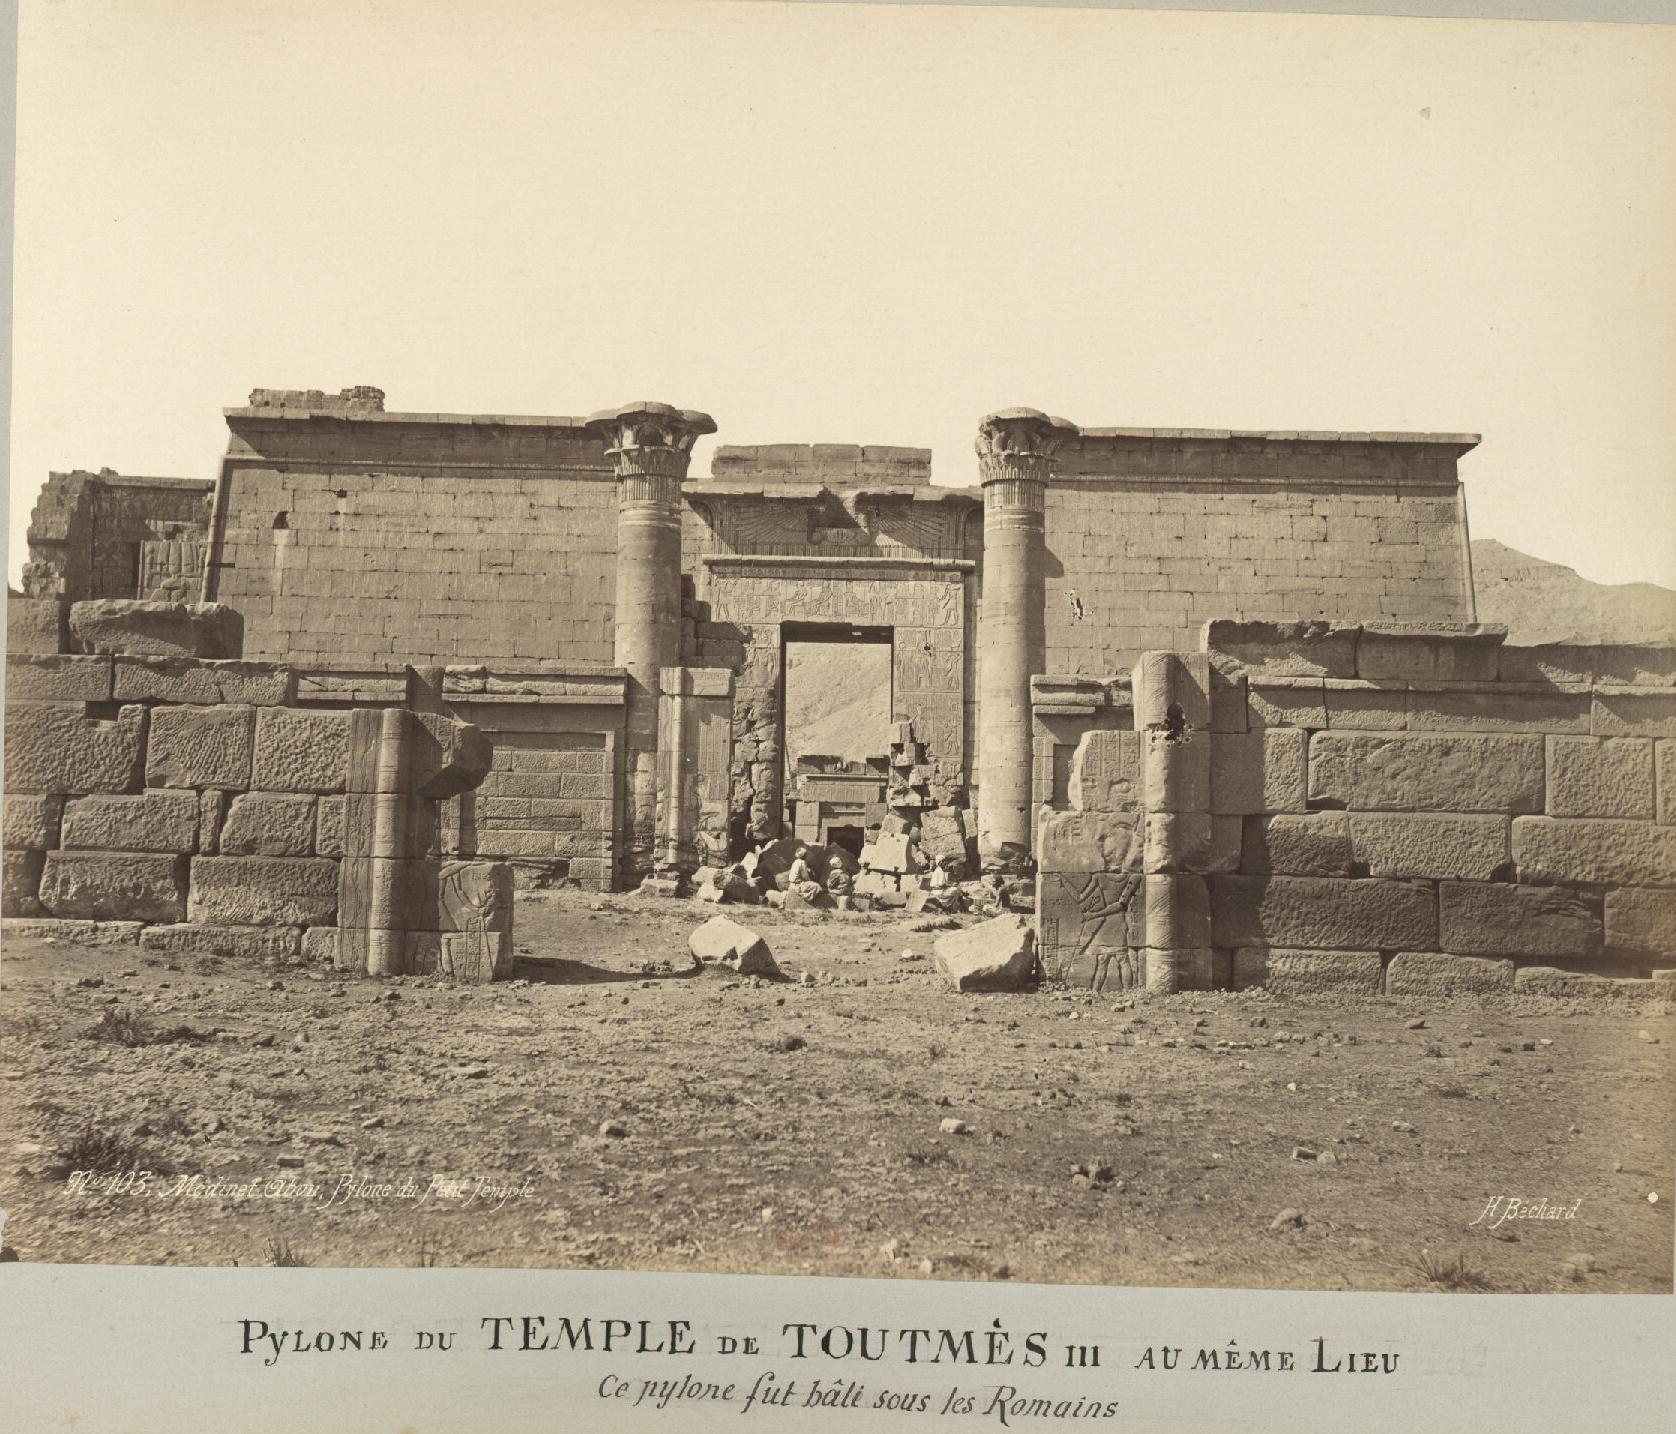 Мединет-Абу. Пилон храма Тутмоса III